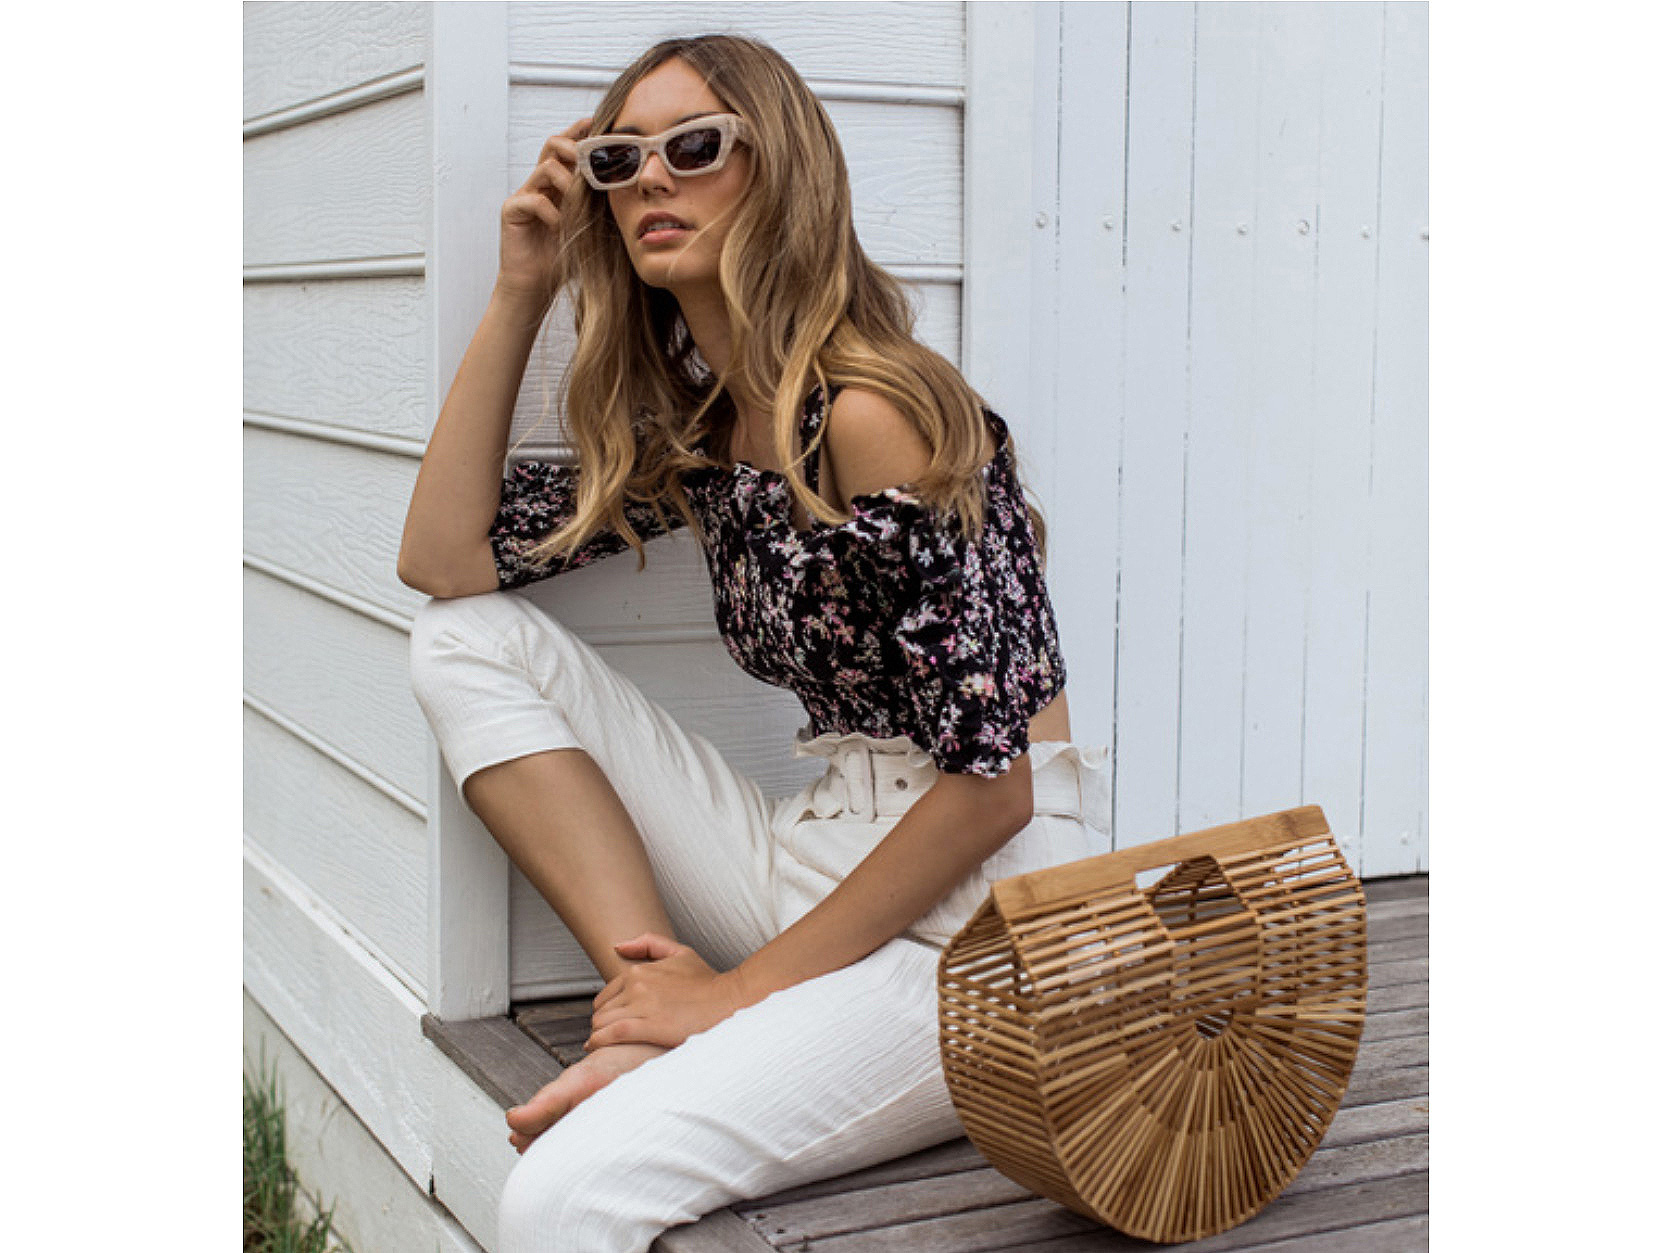 sitting-with-sunglasses.jpg